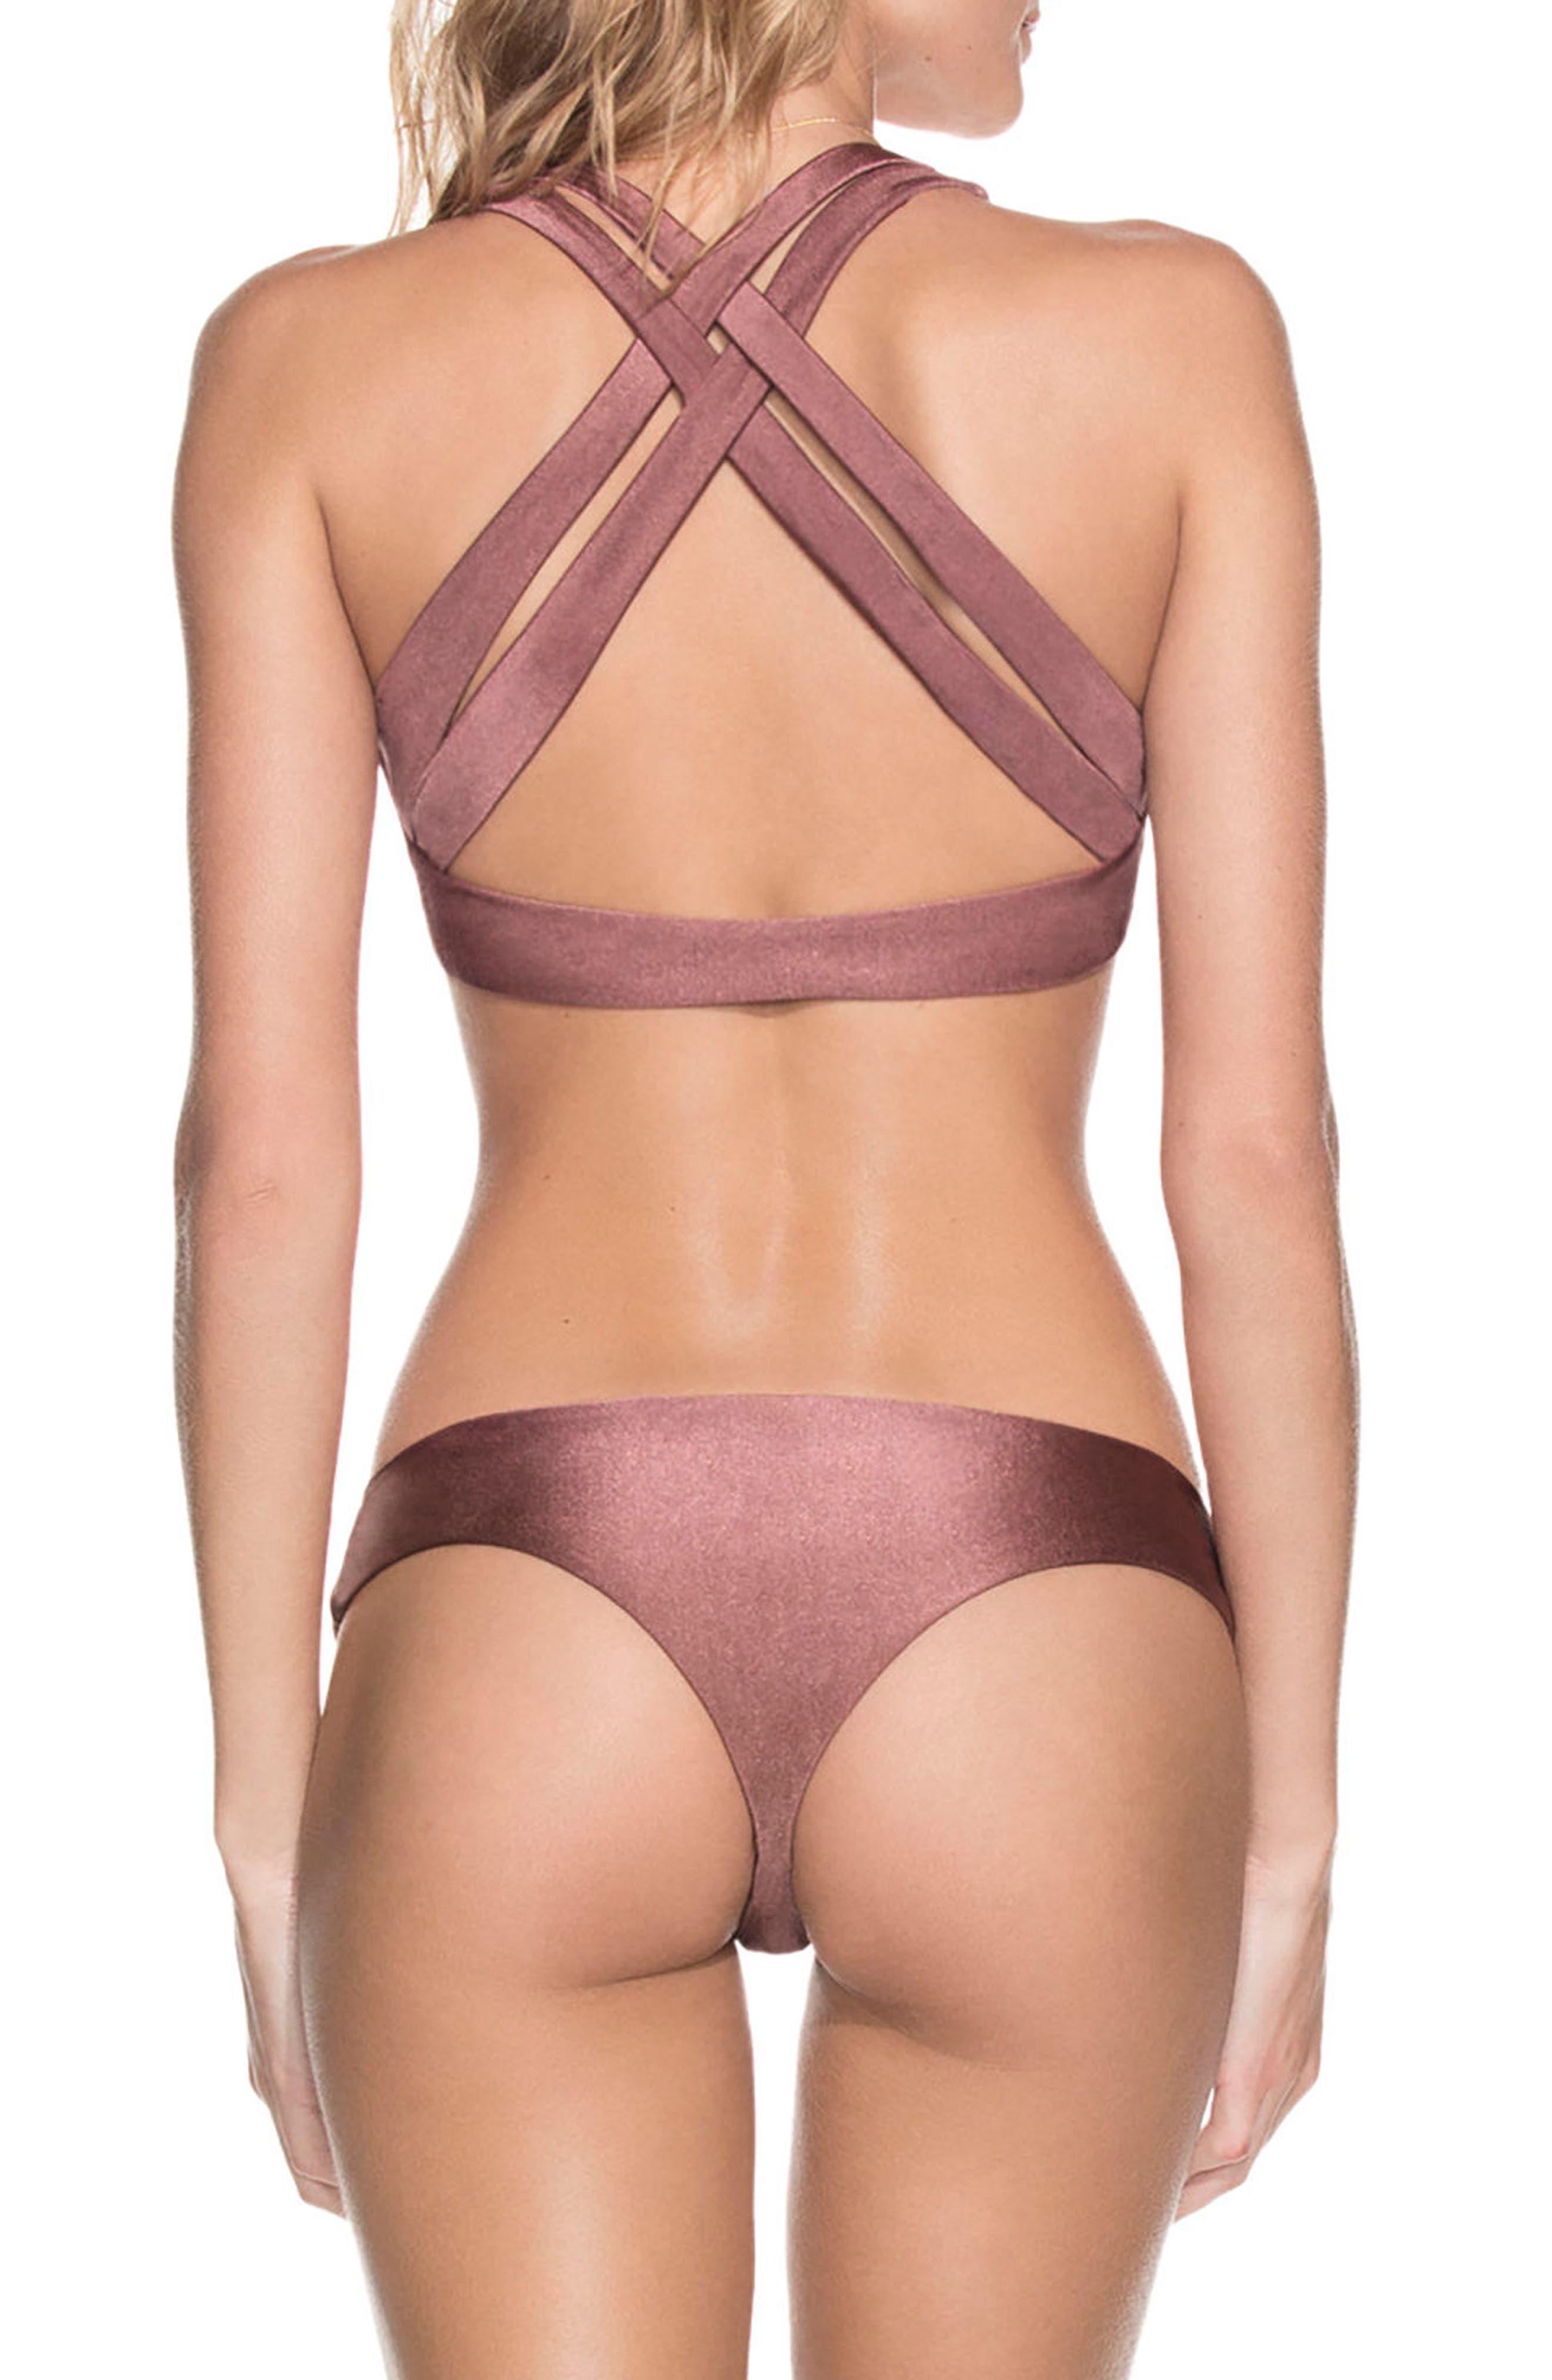 Shimmering Cognac Reversible Bikini Top,                             Alternate thumbnail 5, color,                             221